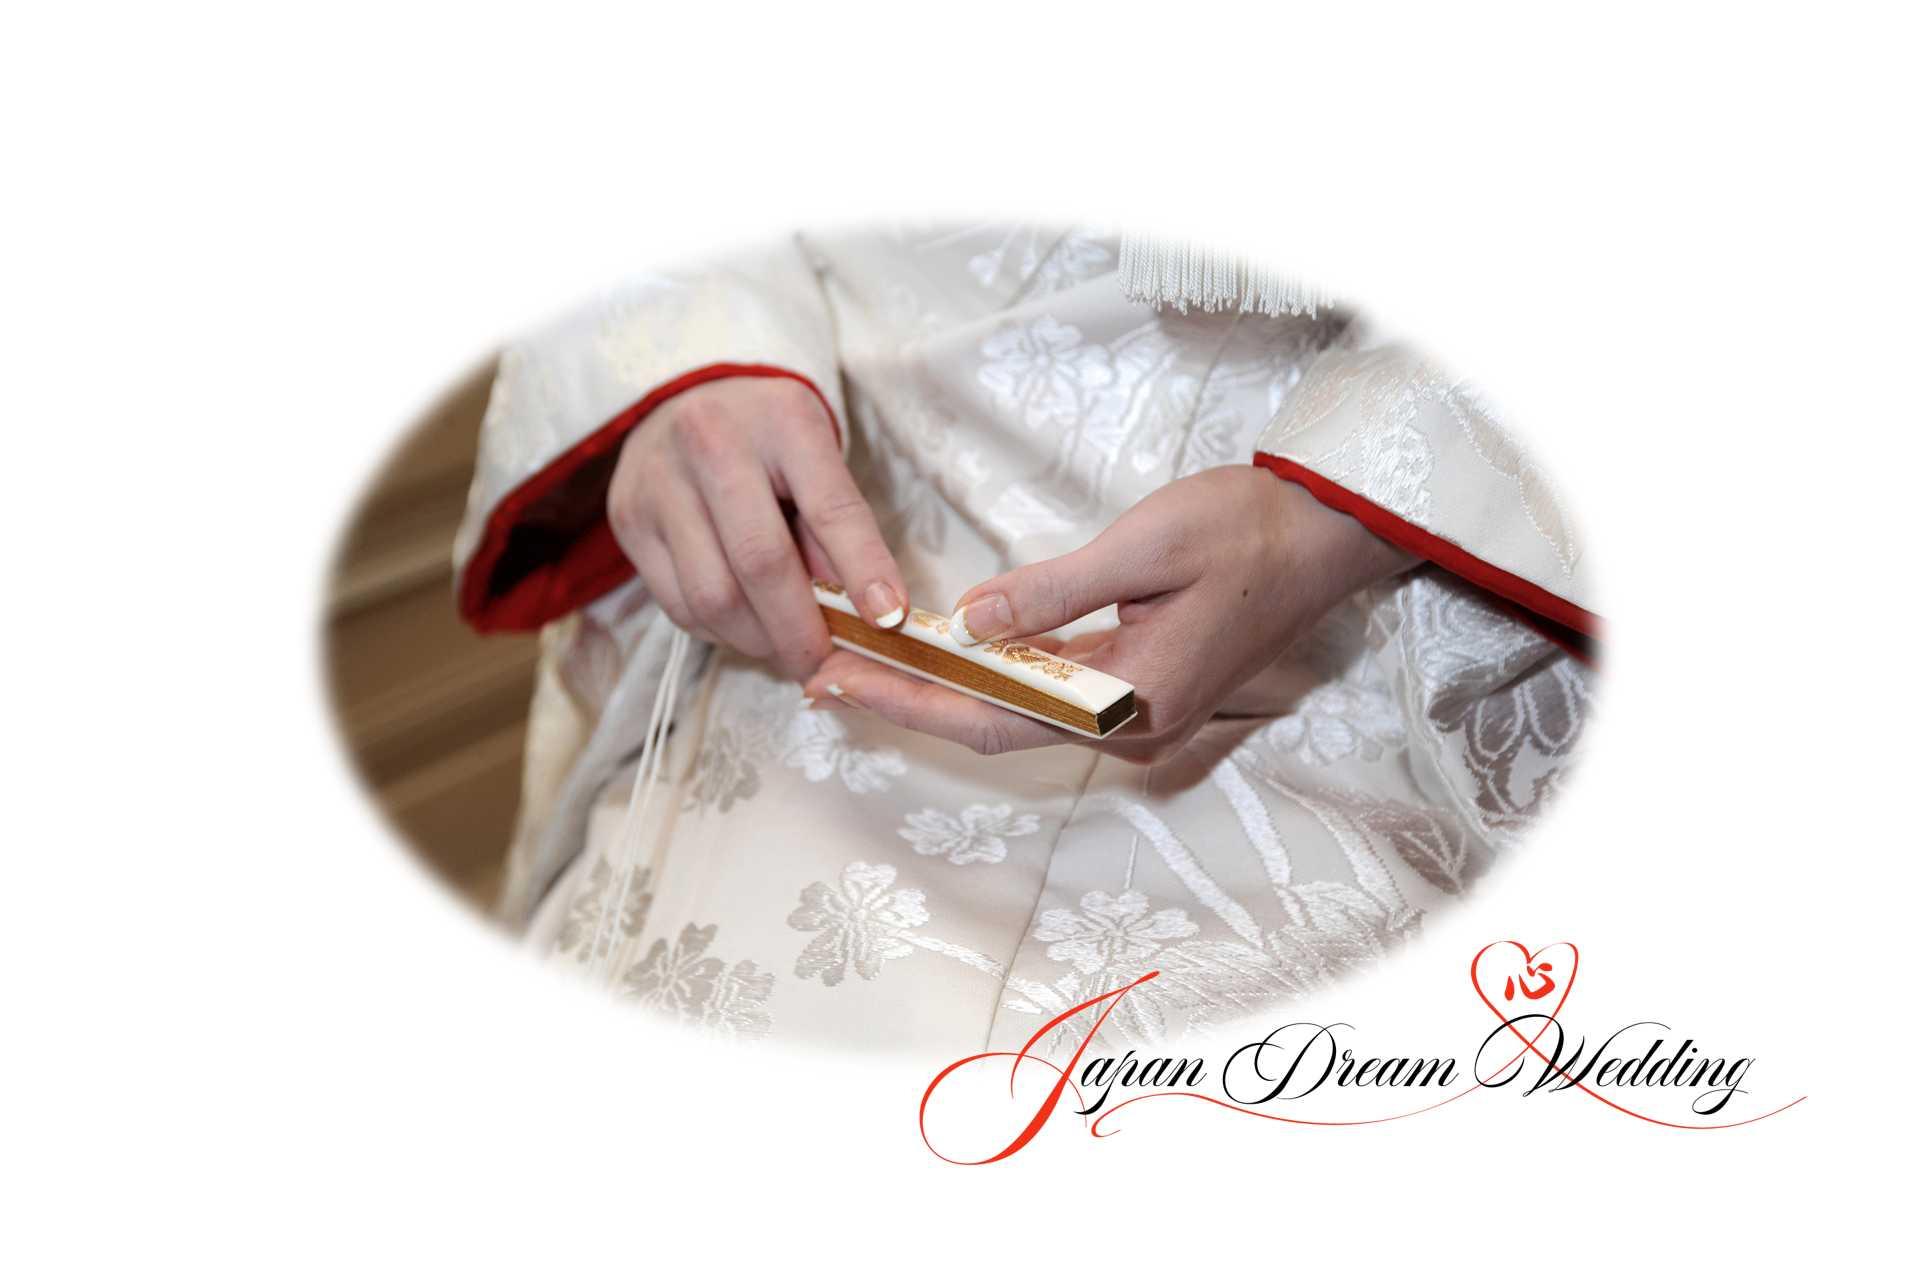 Japan Dream Wedding Bride Ensembles